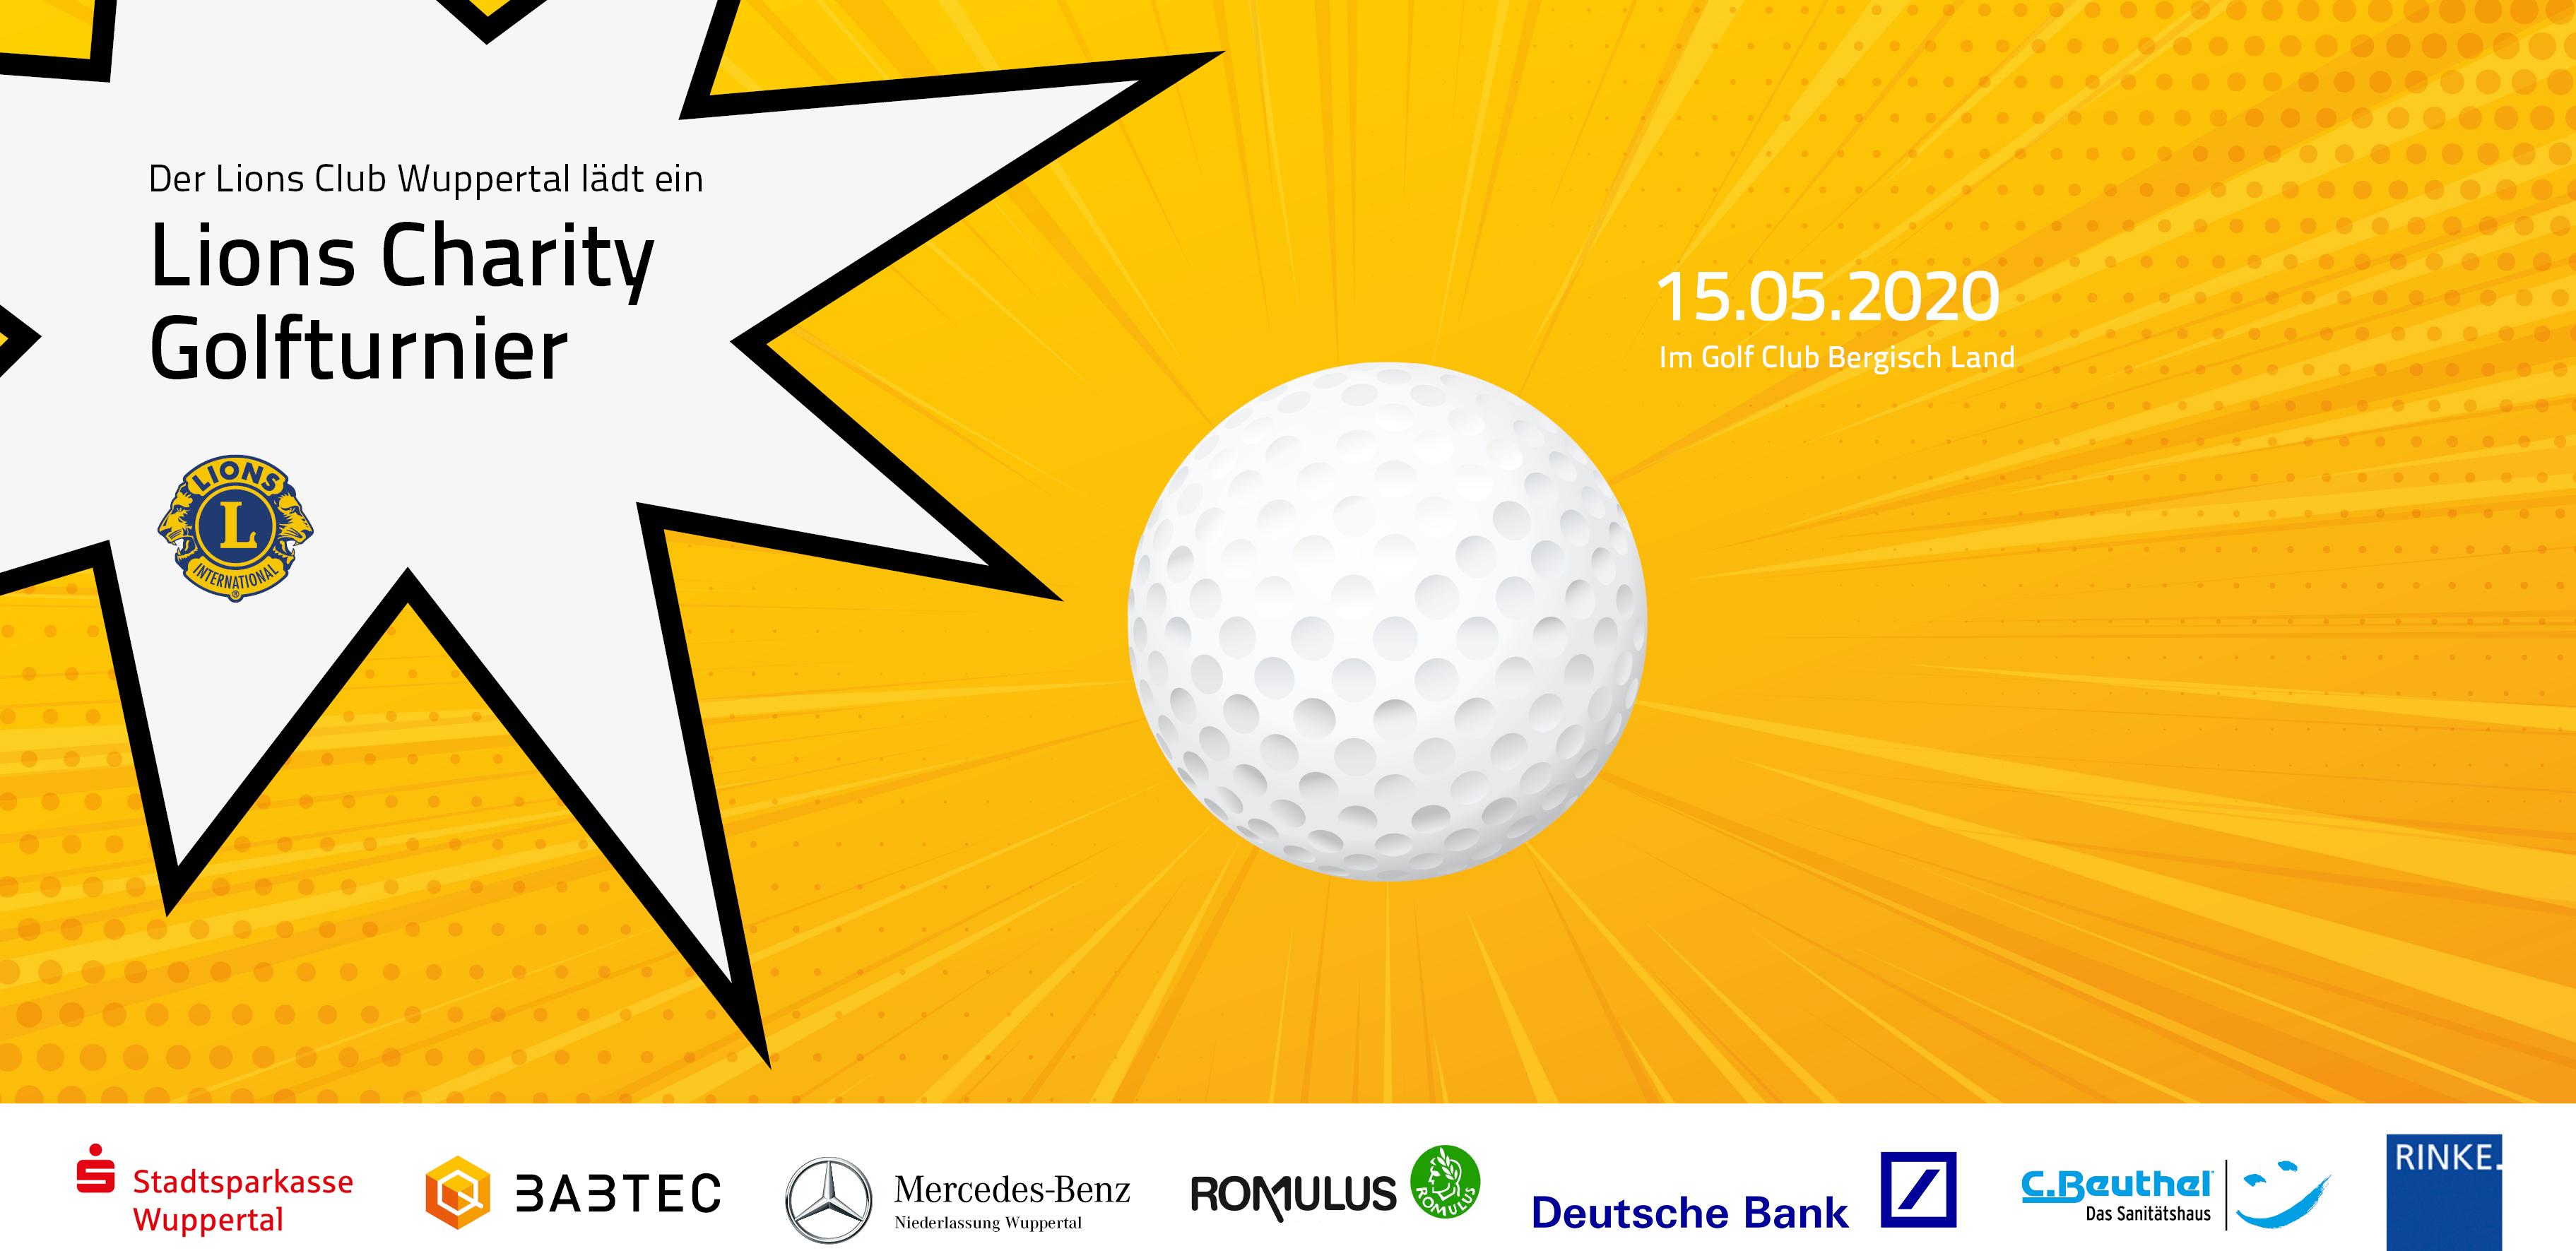 Lions Charity Golfturnier 2020